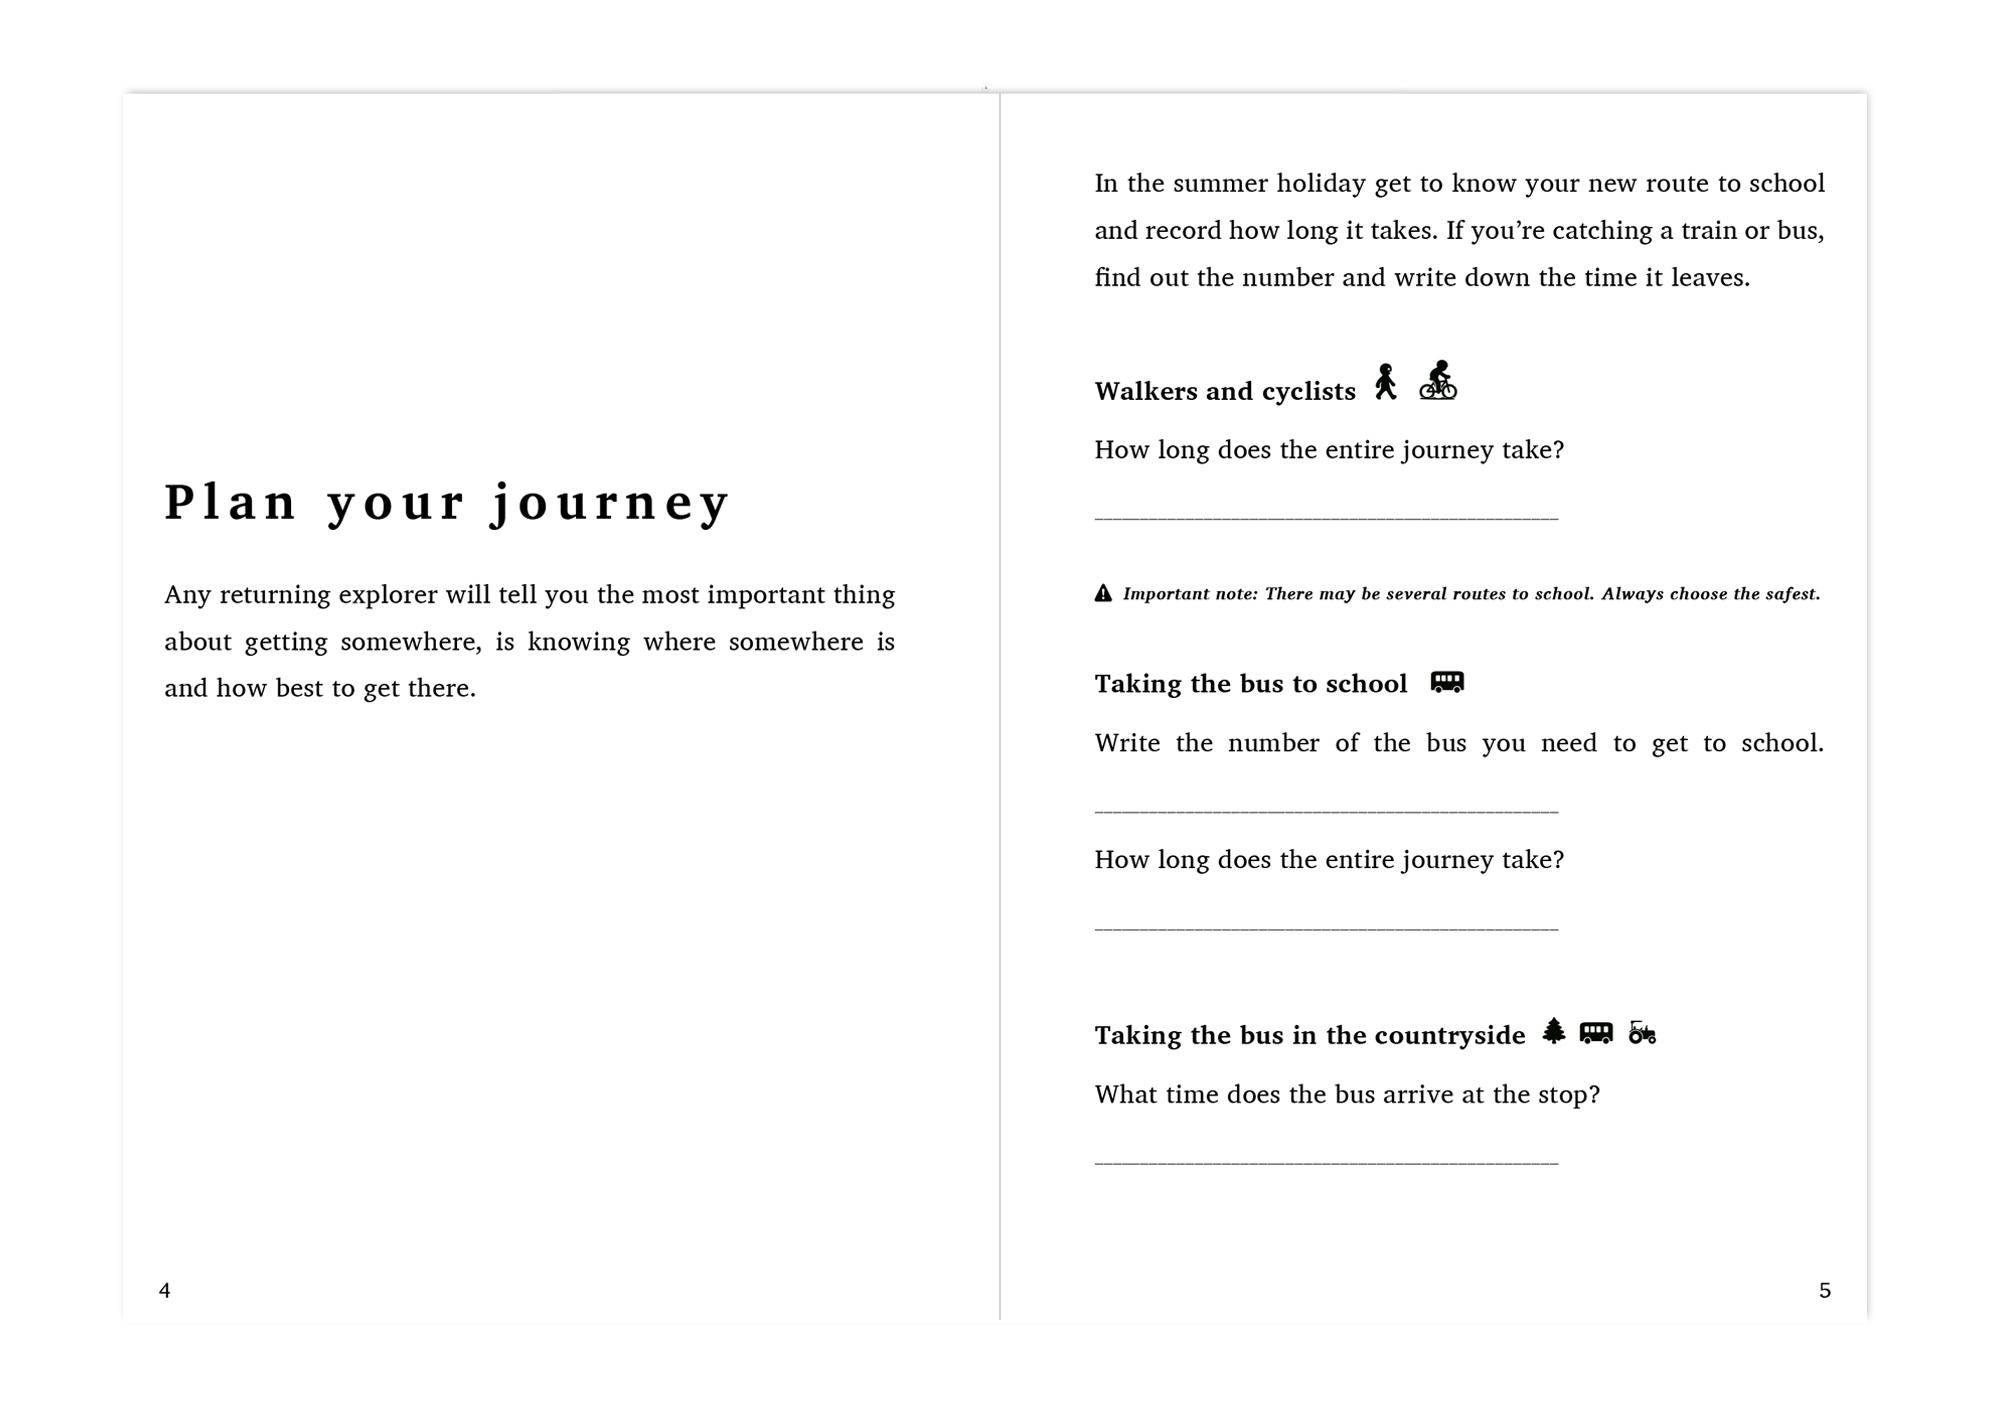 SG-Spead-plan your journey.jpg